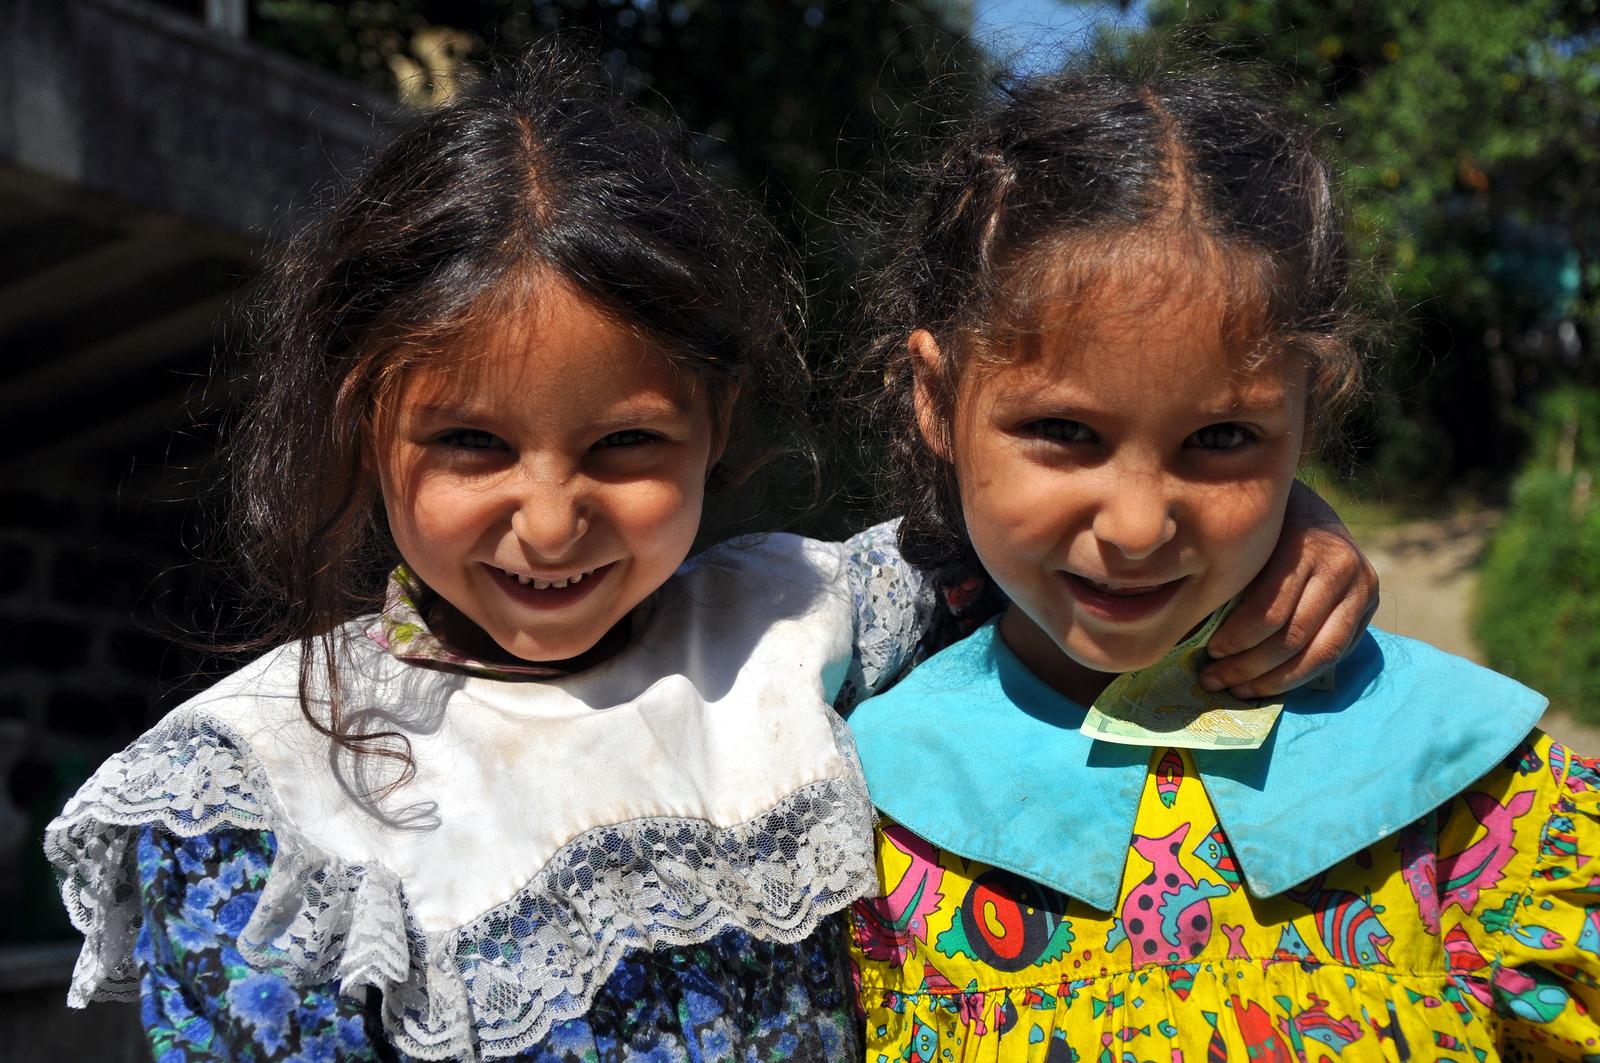 bigstock-Gypsy-Romani-girls-begging-47815883 - Emerging Europe